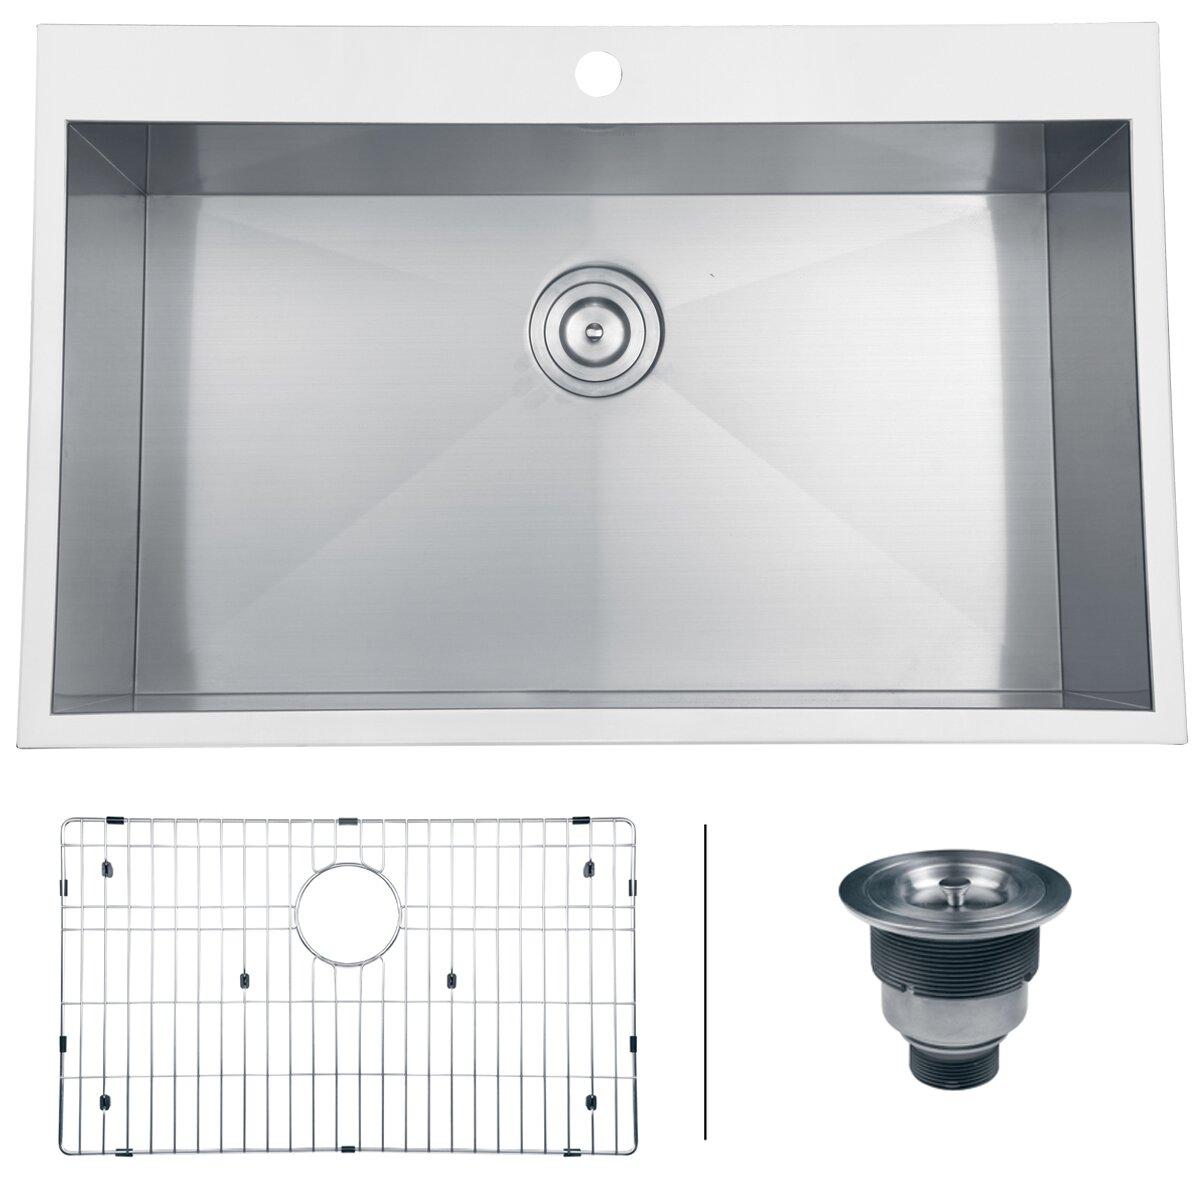 tirana 33 x 21 drop in single bowl kitchen sink - Bowl Kitchen Sink